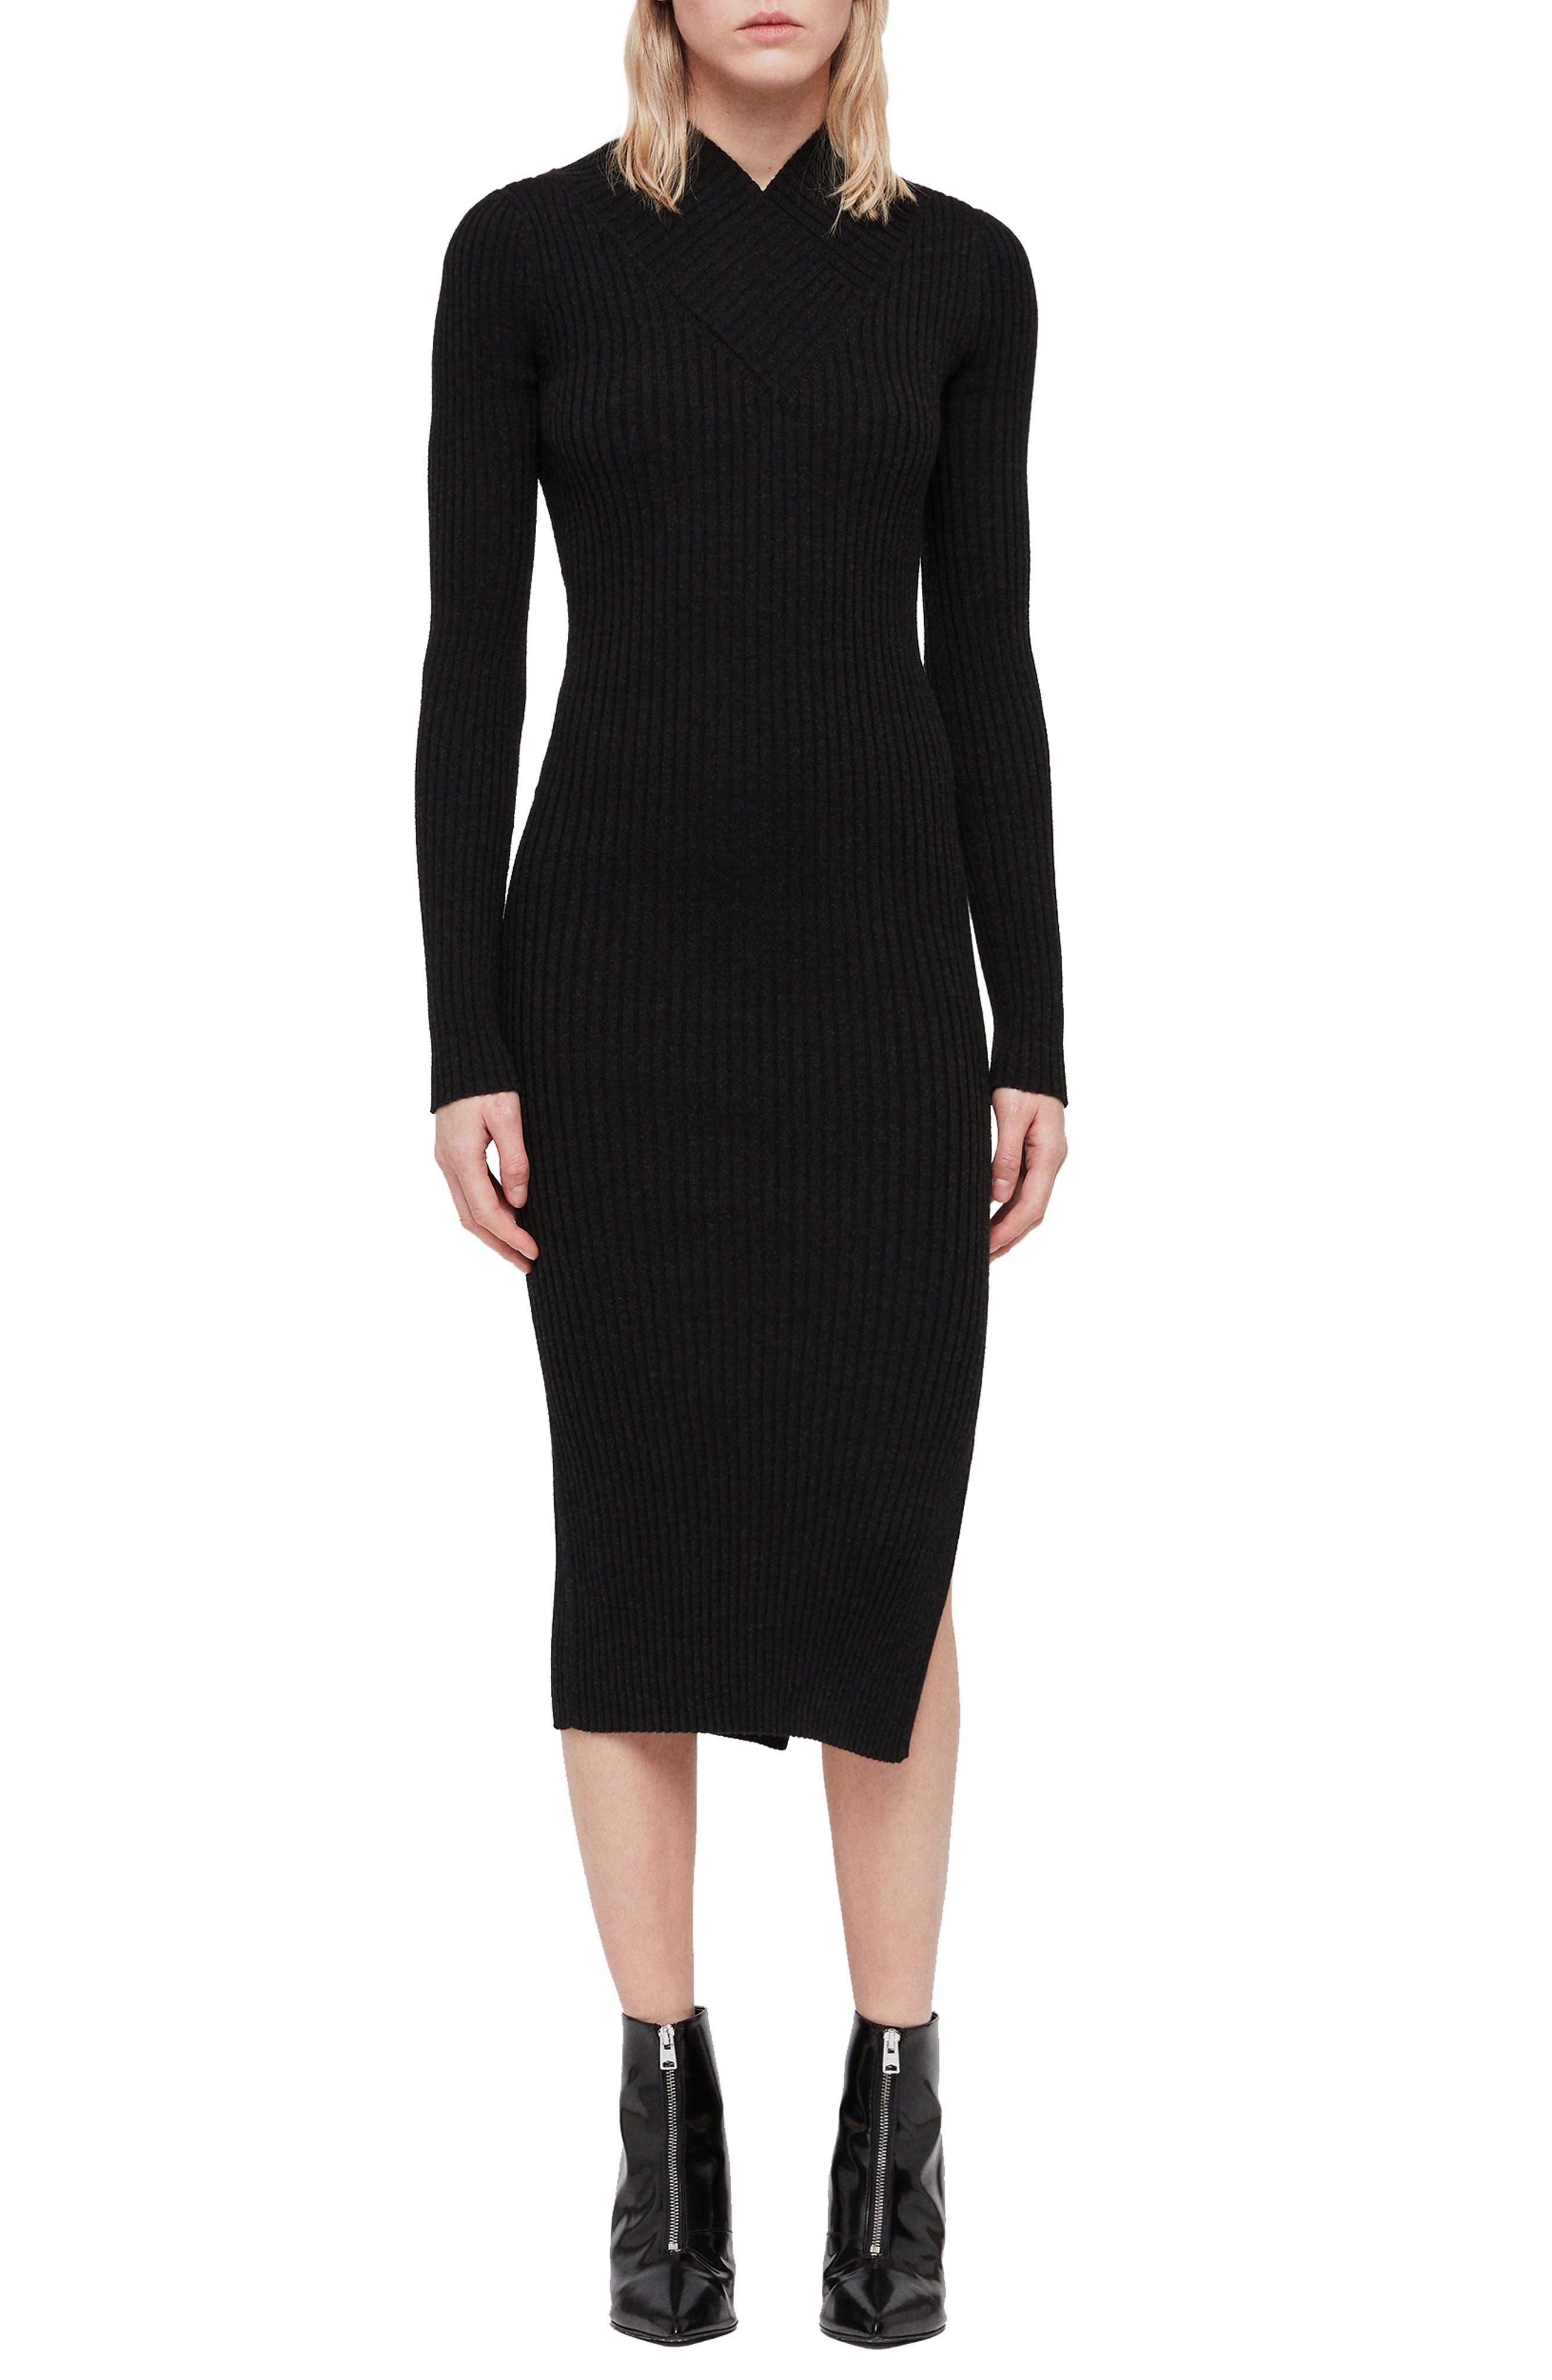 ALLSAINTS Vries Merino Wool Sweater Dress in Cinder Black Marl